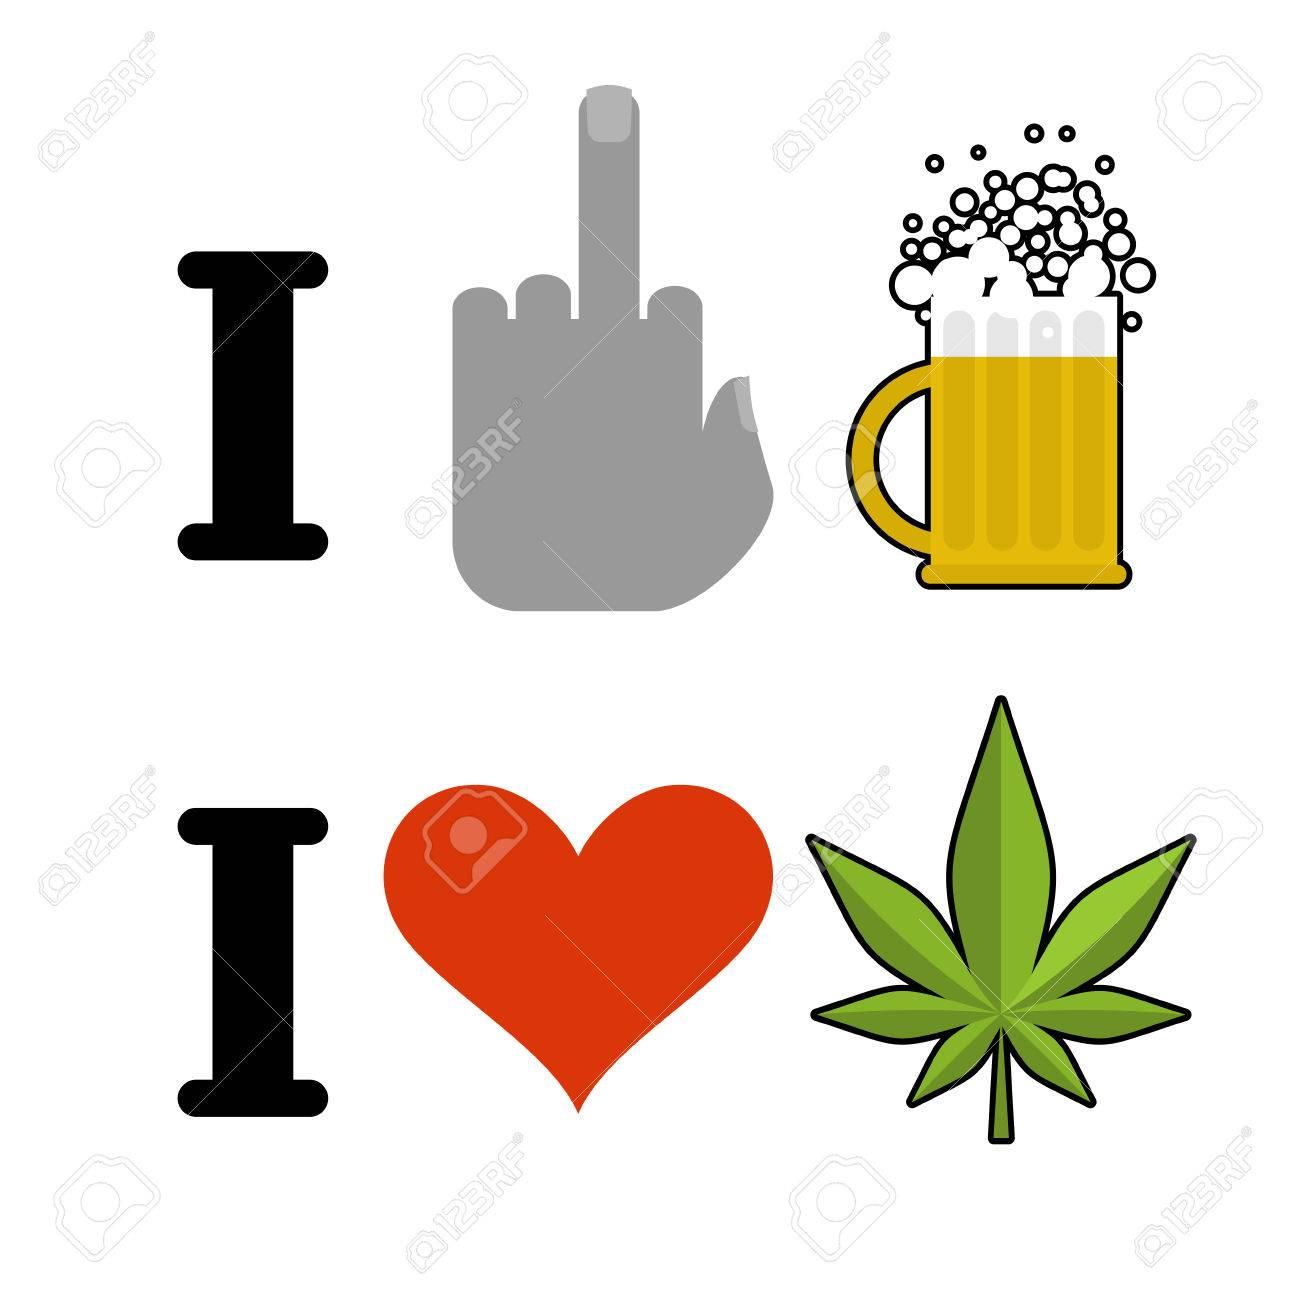 I hate alcohol i like drugs fuck symbol of hatred and mug of fuck symbol of hatred and mug of beer biocorpaavc Choice Image